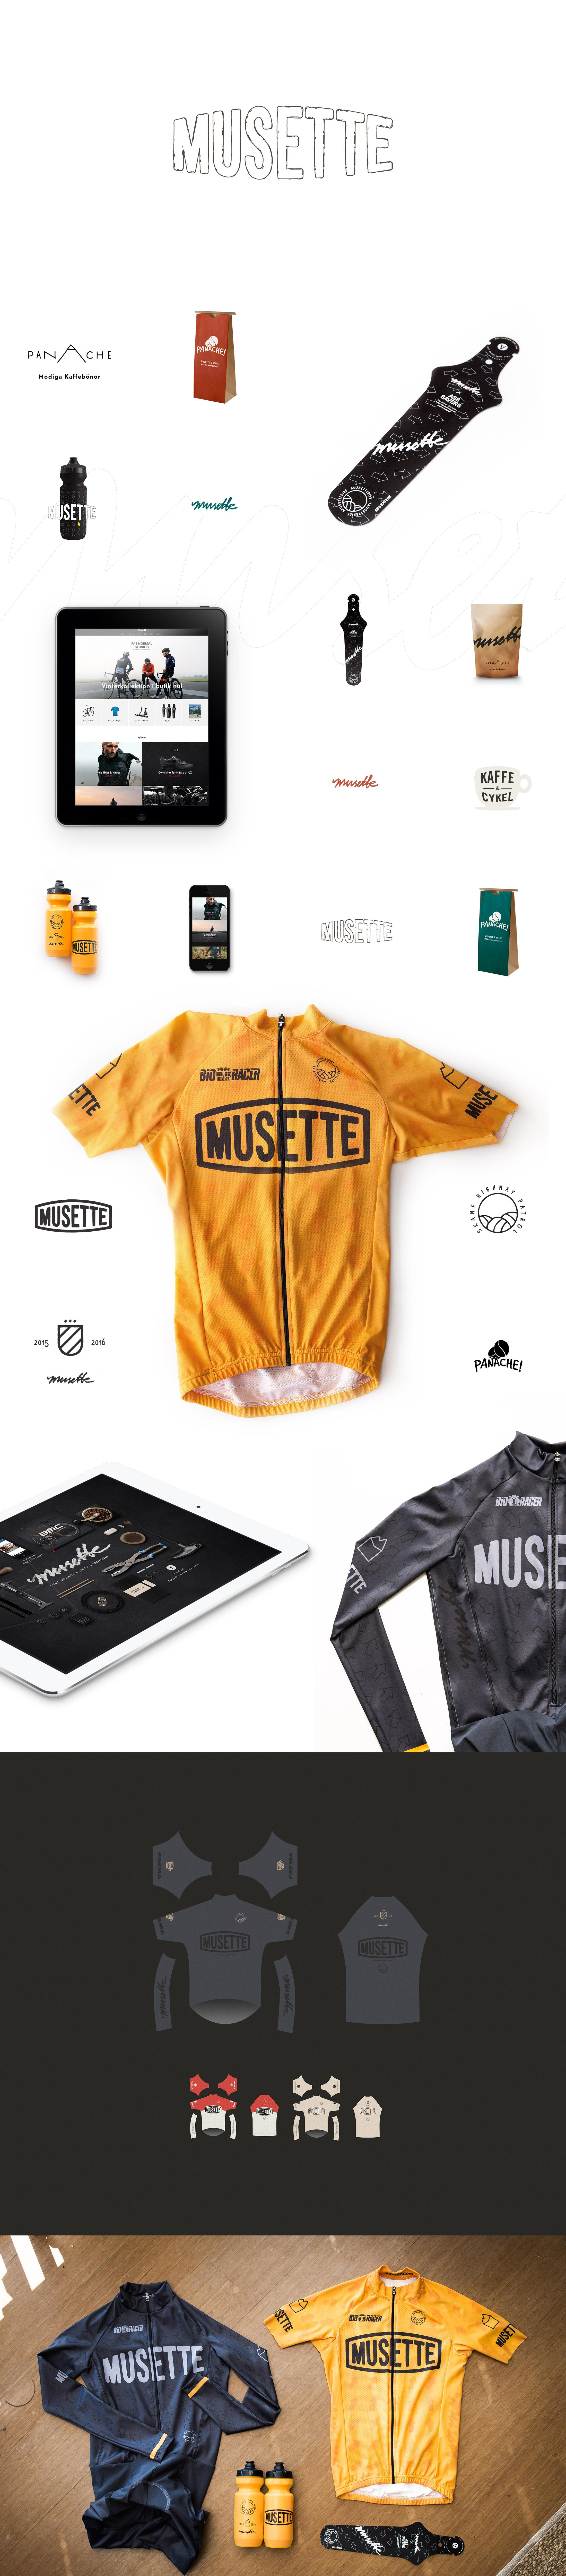 Case-Musette2